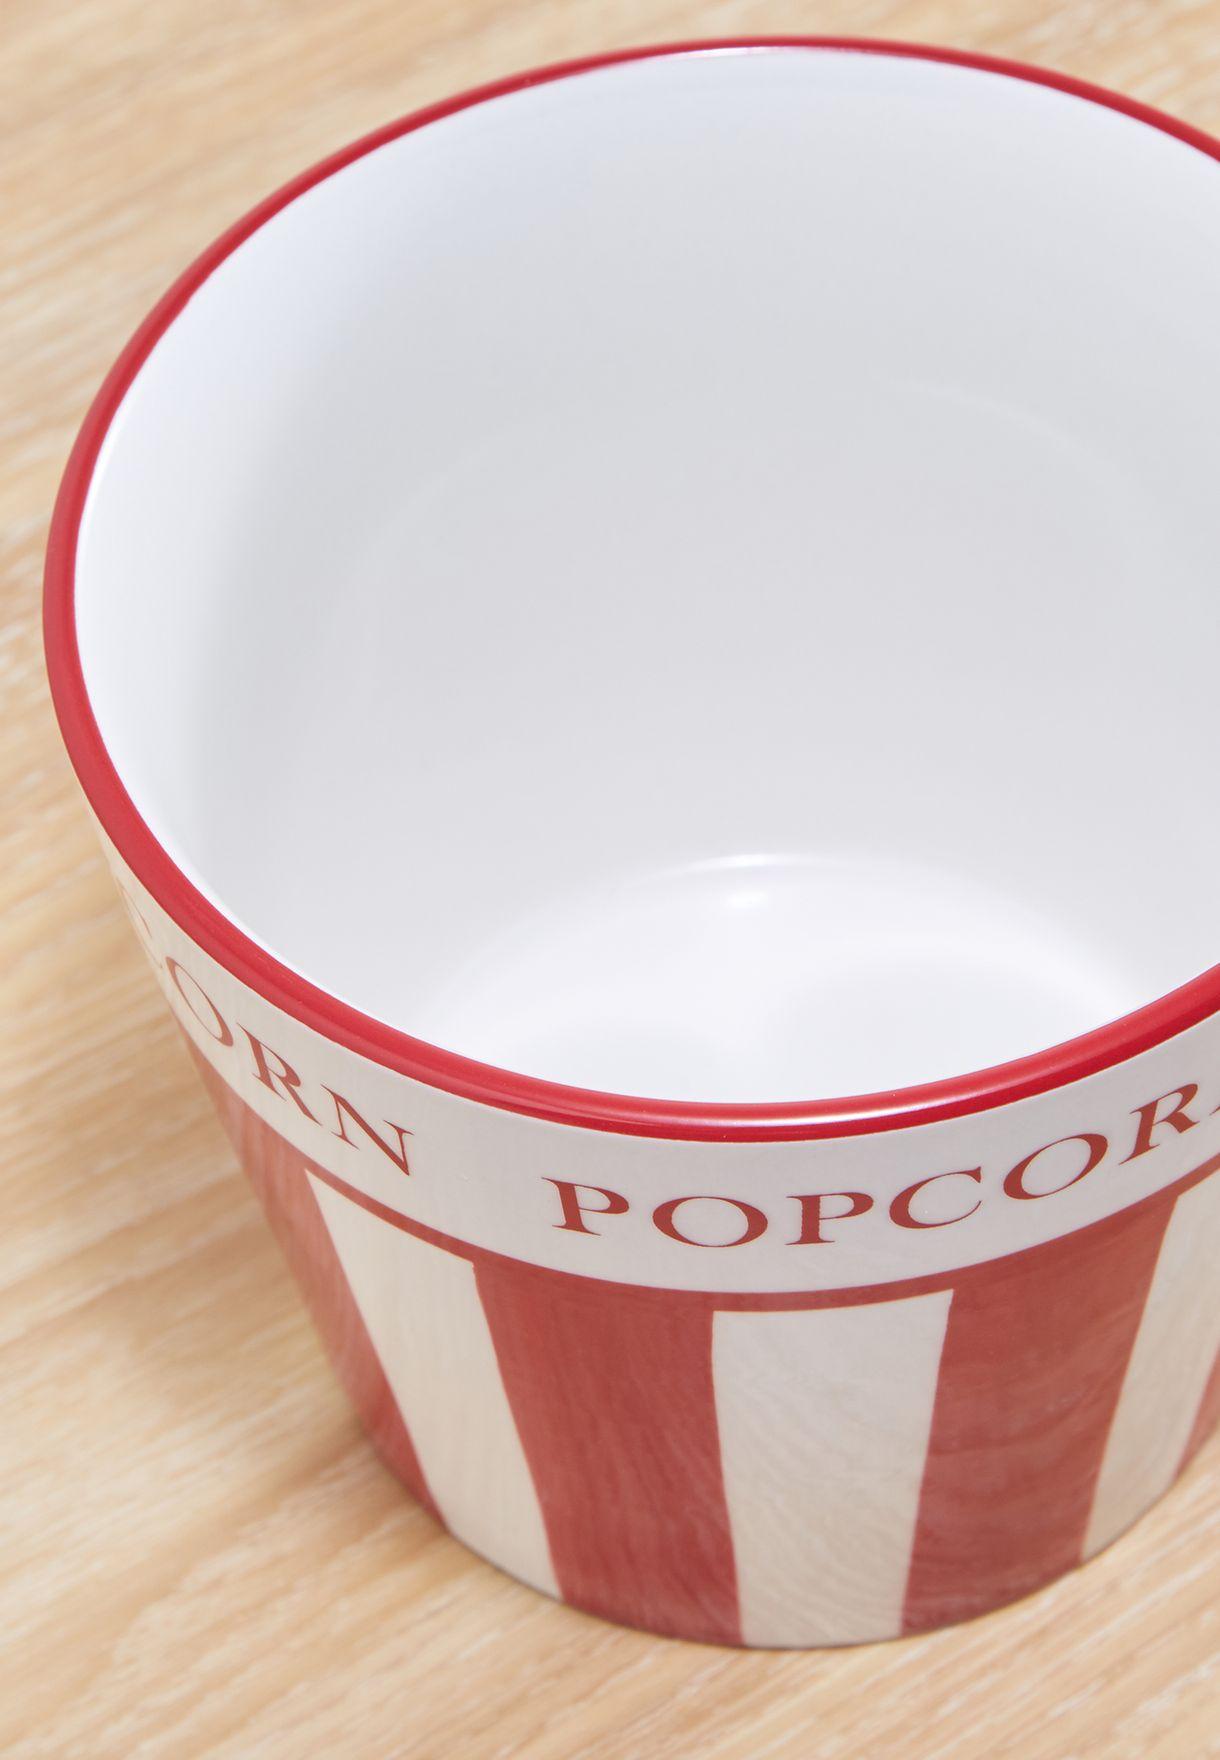 Small Hollywood Popcorn Bowl